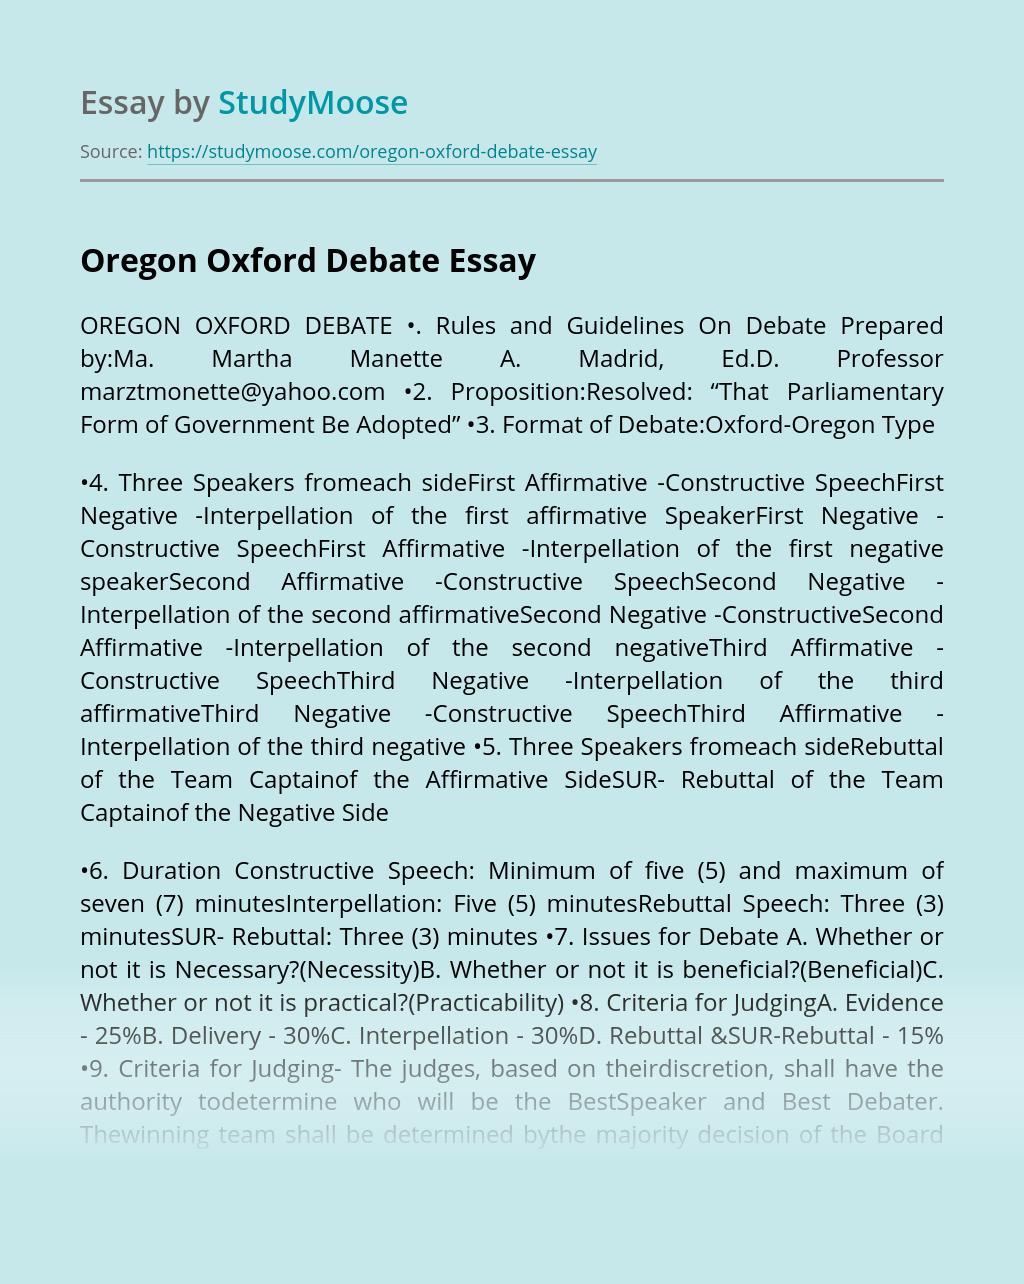 Oregon Oxford Debate